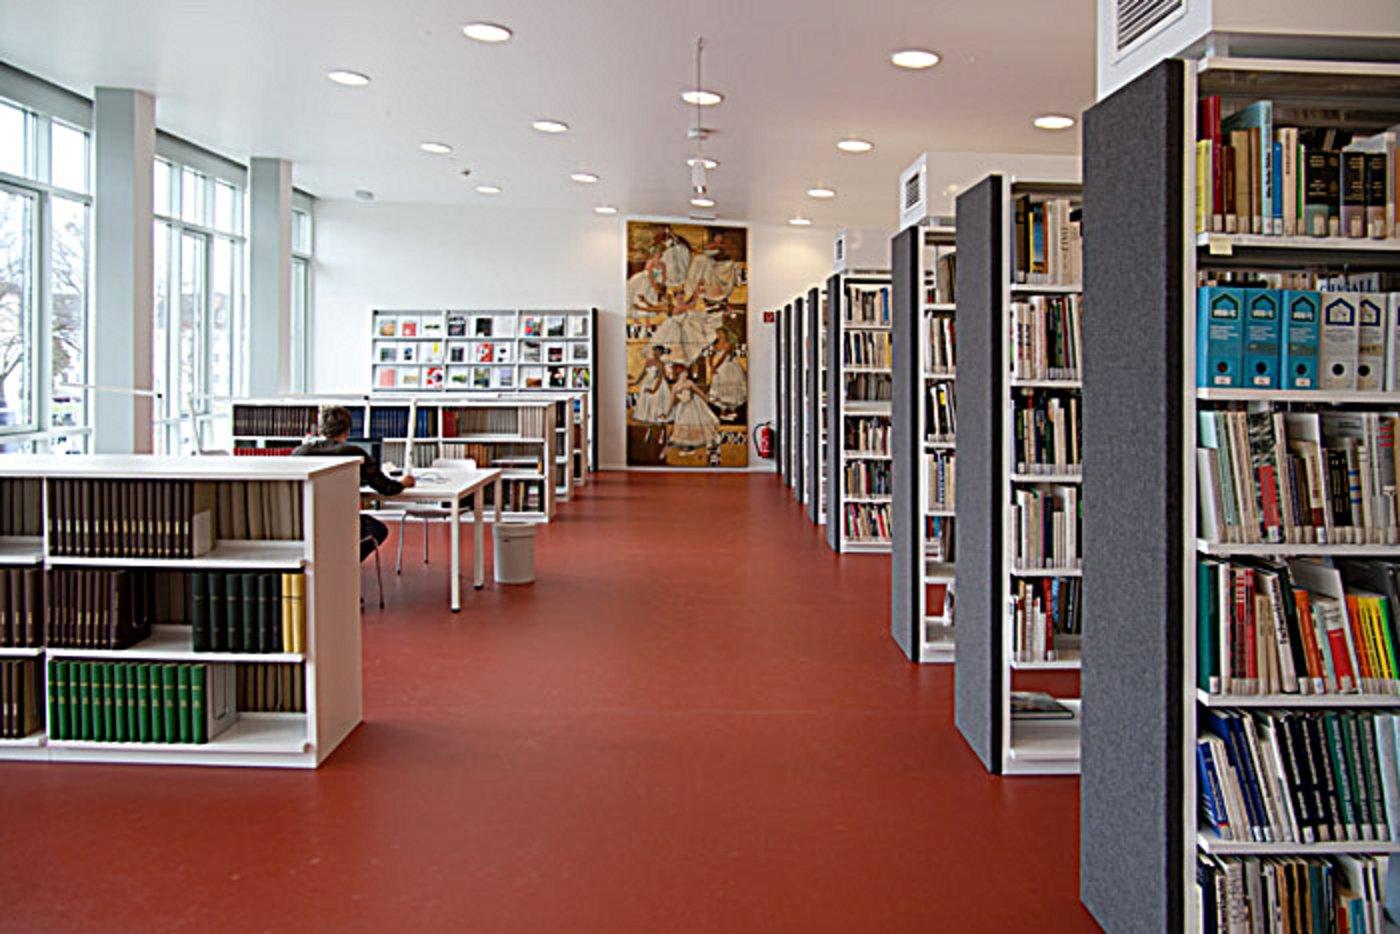 bibliothek stiftung bauhaus dessau bauhaus dessau foundation. Black Bedroom Furniture Sets. Home Design Ideas